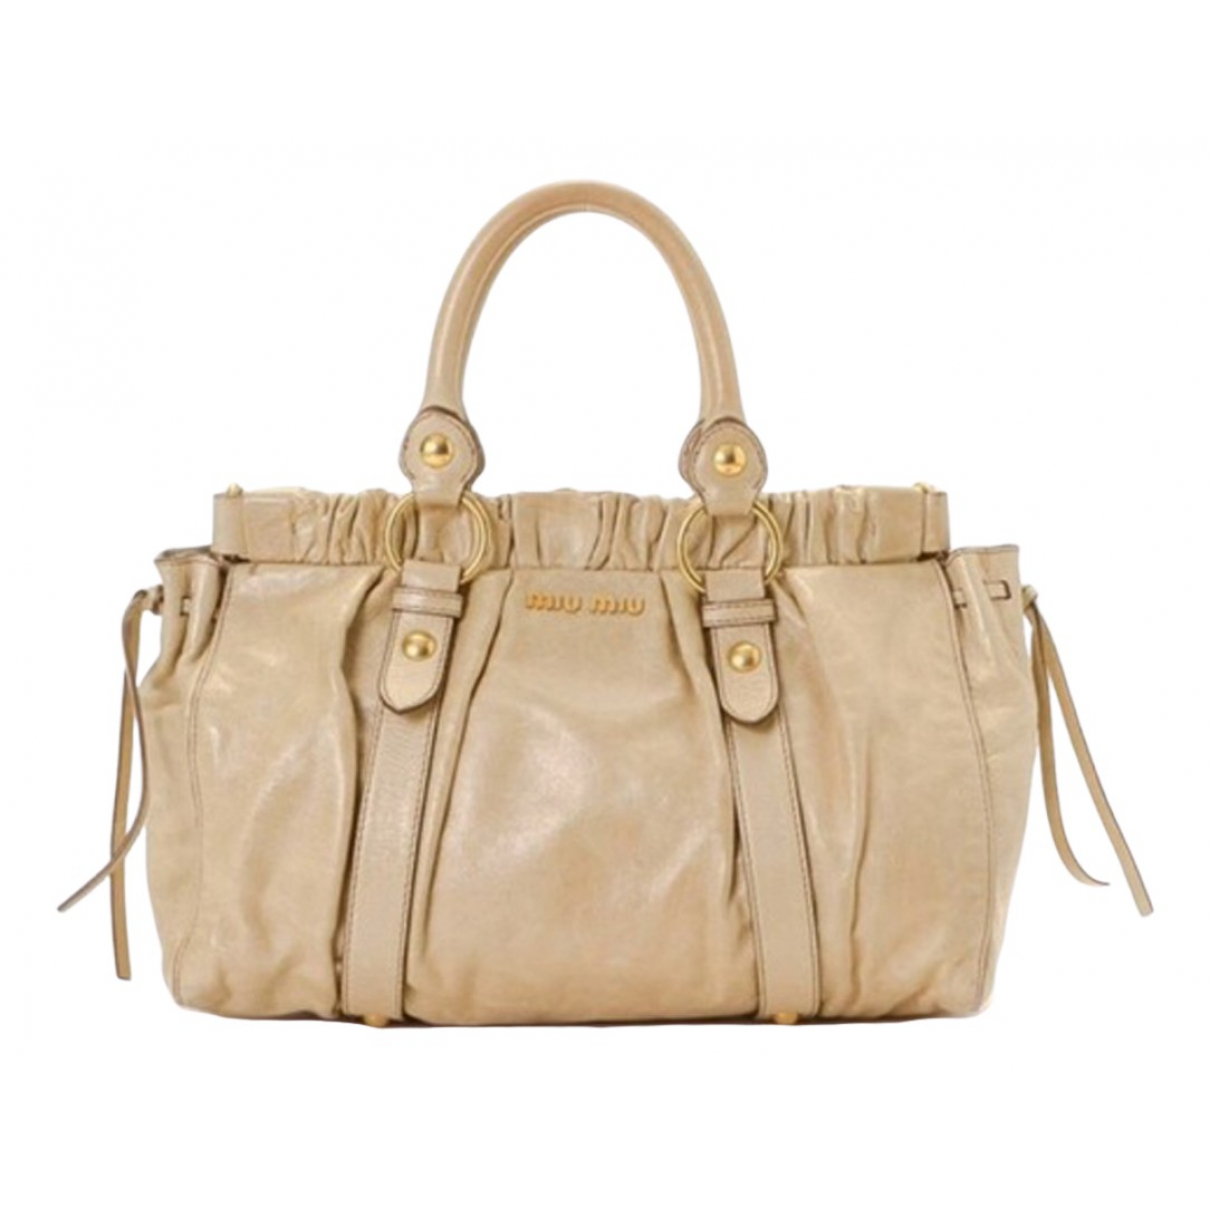 Miu Miu N Beige Leather handbag for Women N